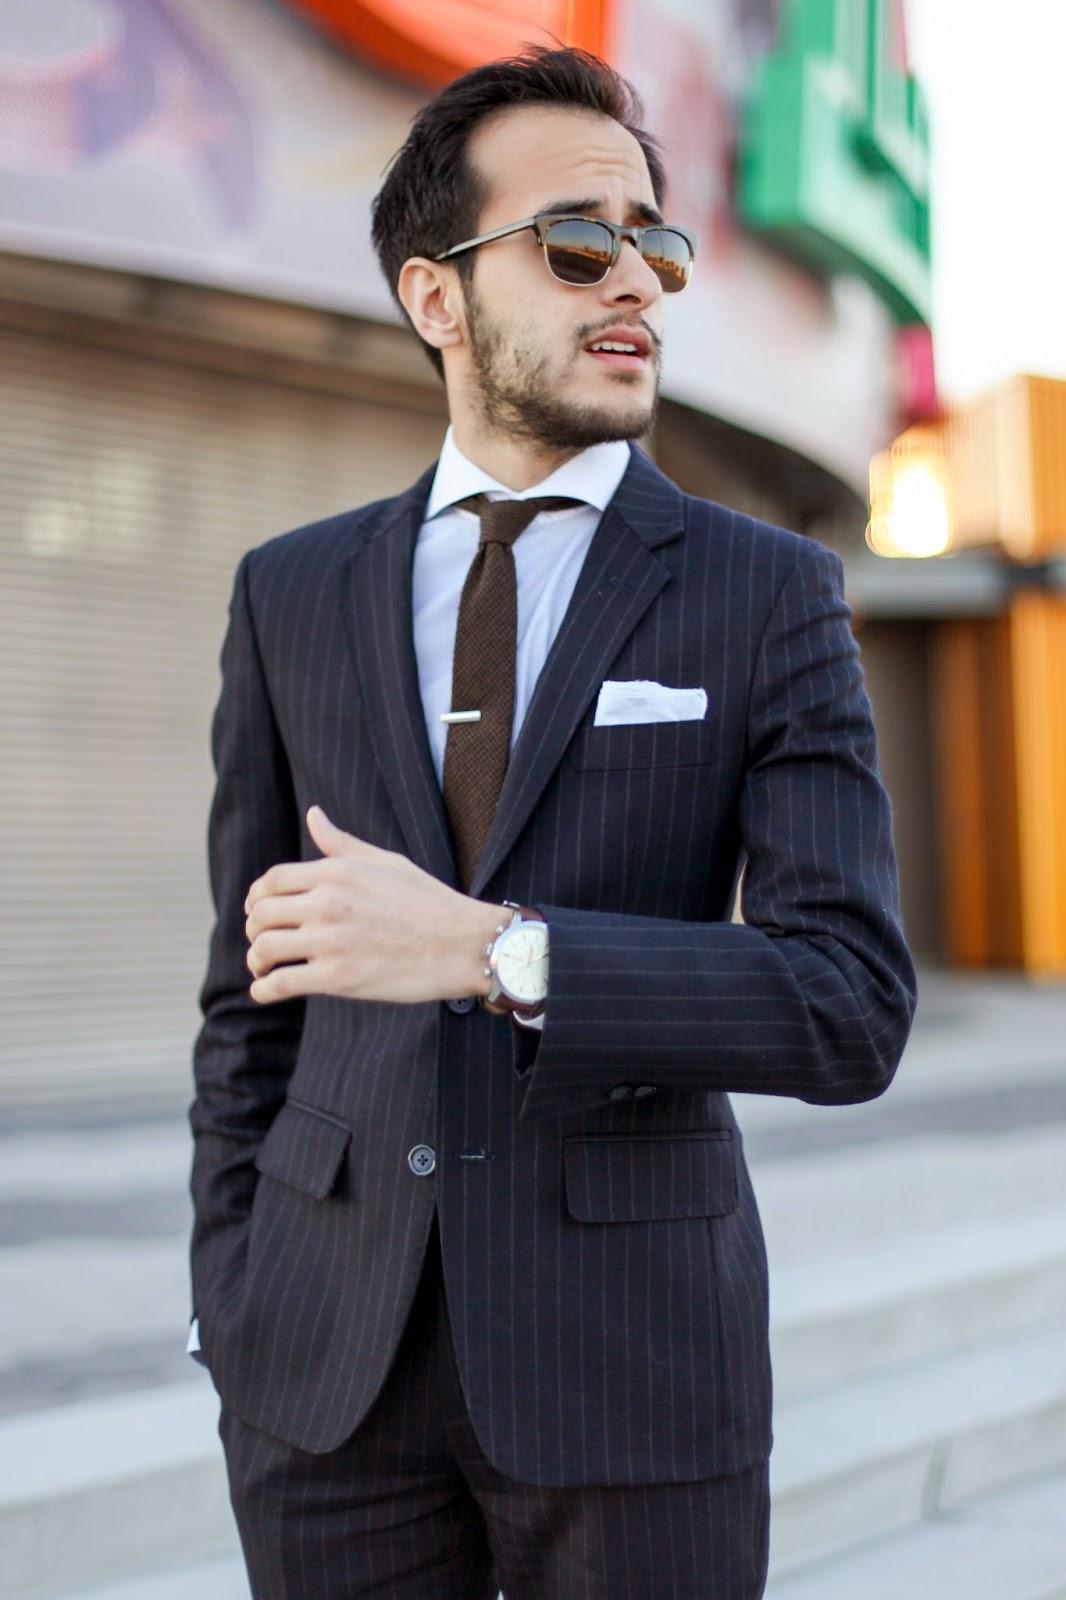 Born To Tailor Bespoke Custom Tailor Suits New York Varun Gandhi 6.JPG